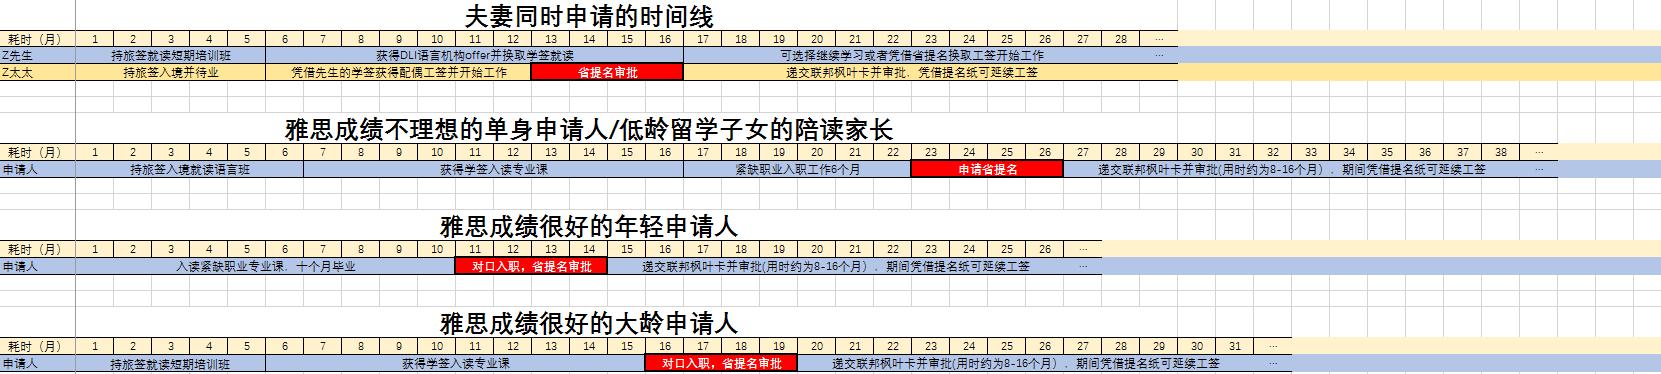 曼省时间线截图.png